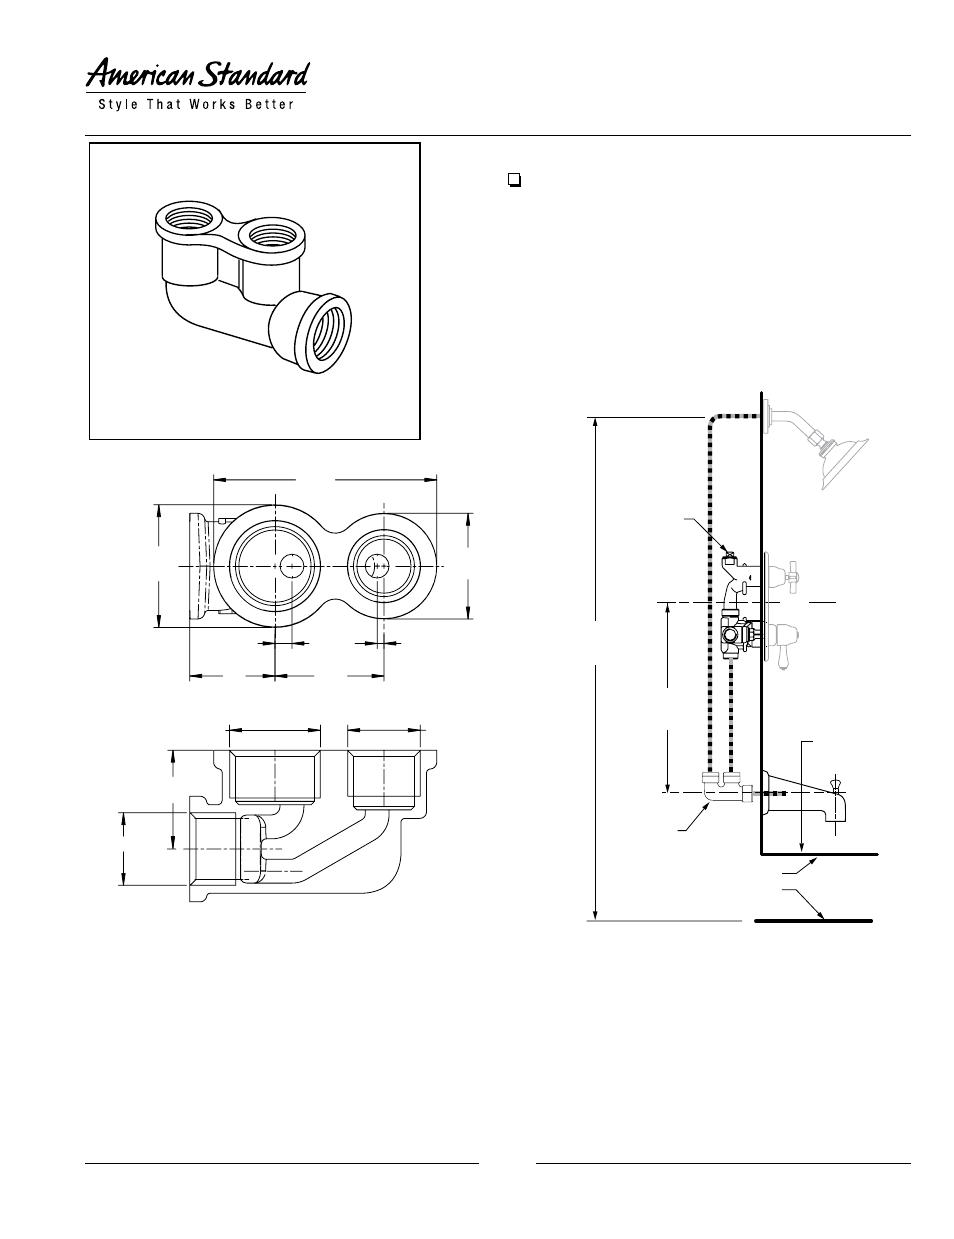 American Standard Twin Ell 8888 120 User Manual 1 Page American Standard Shower Installation Manual